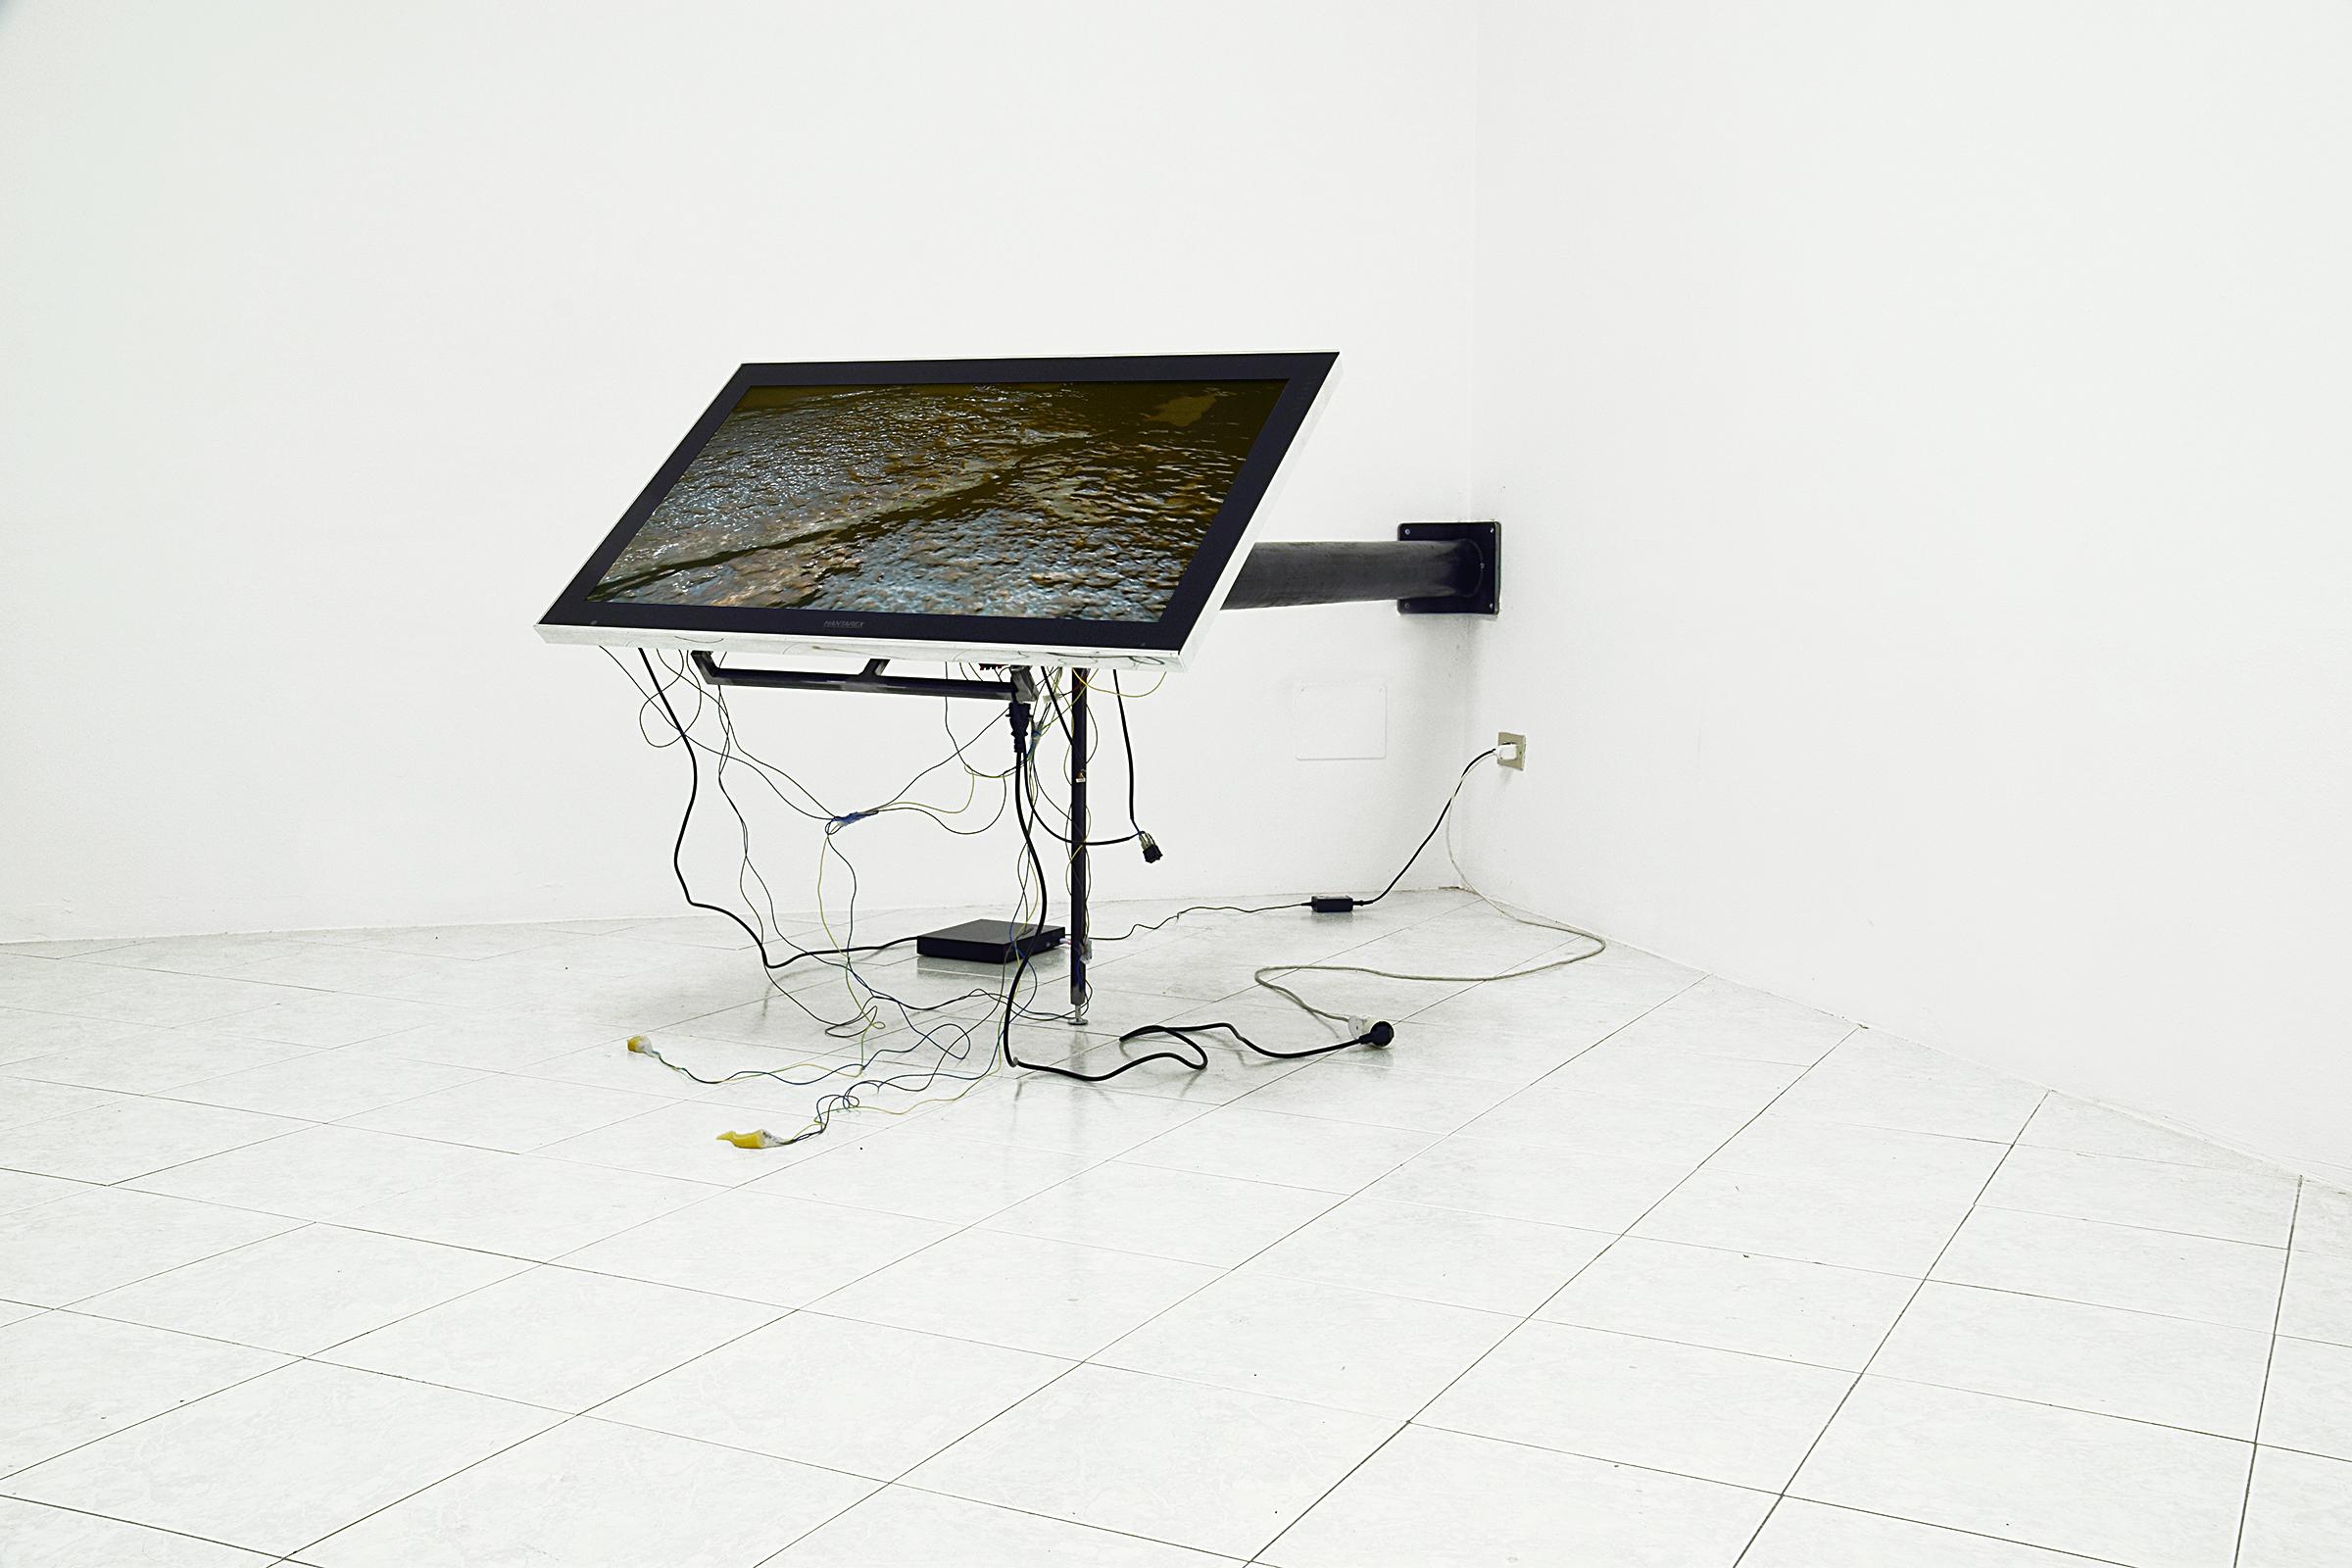 Overground from Abnormality (2018), Agostino Bergamaschi